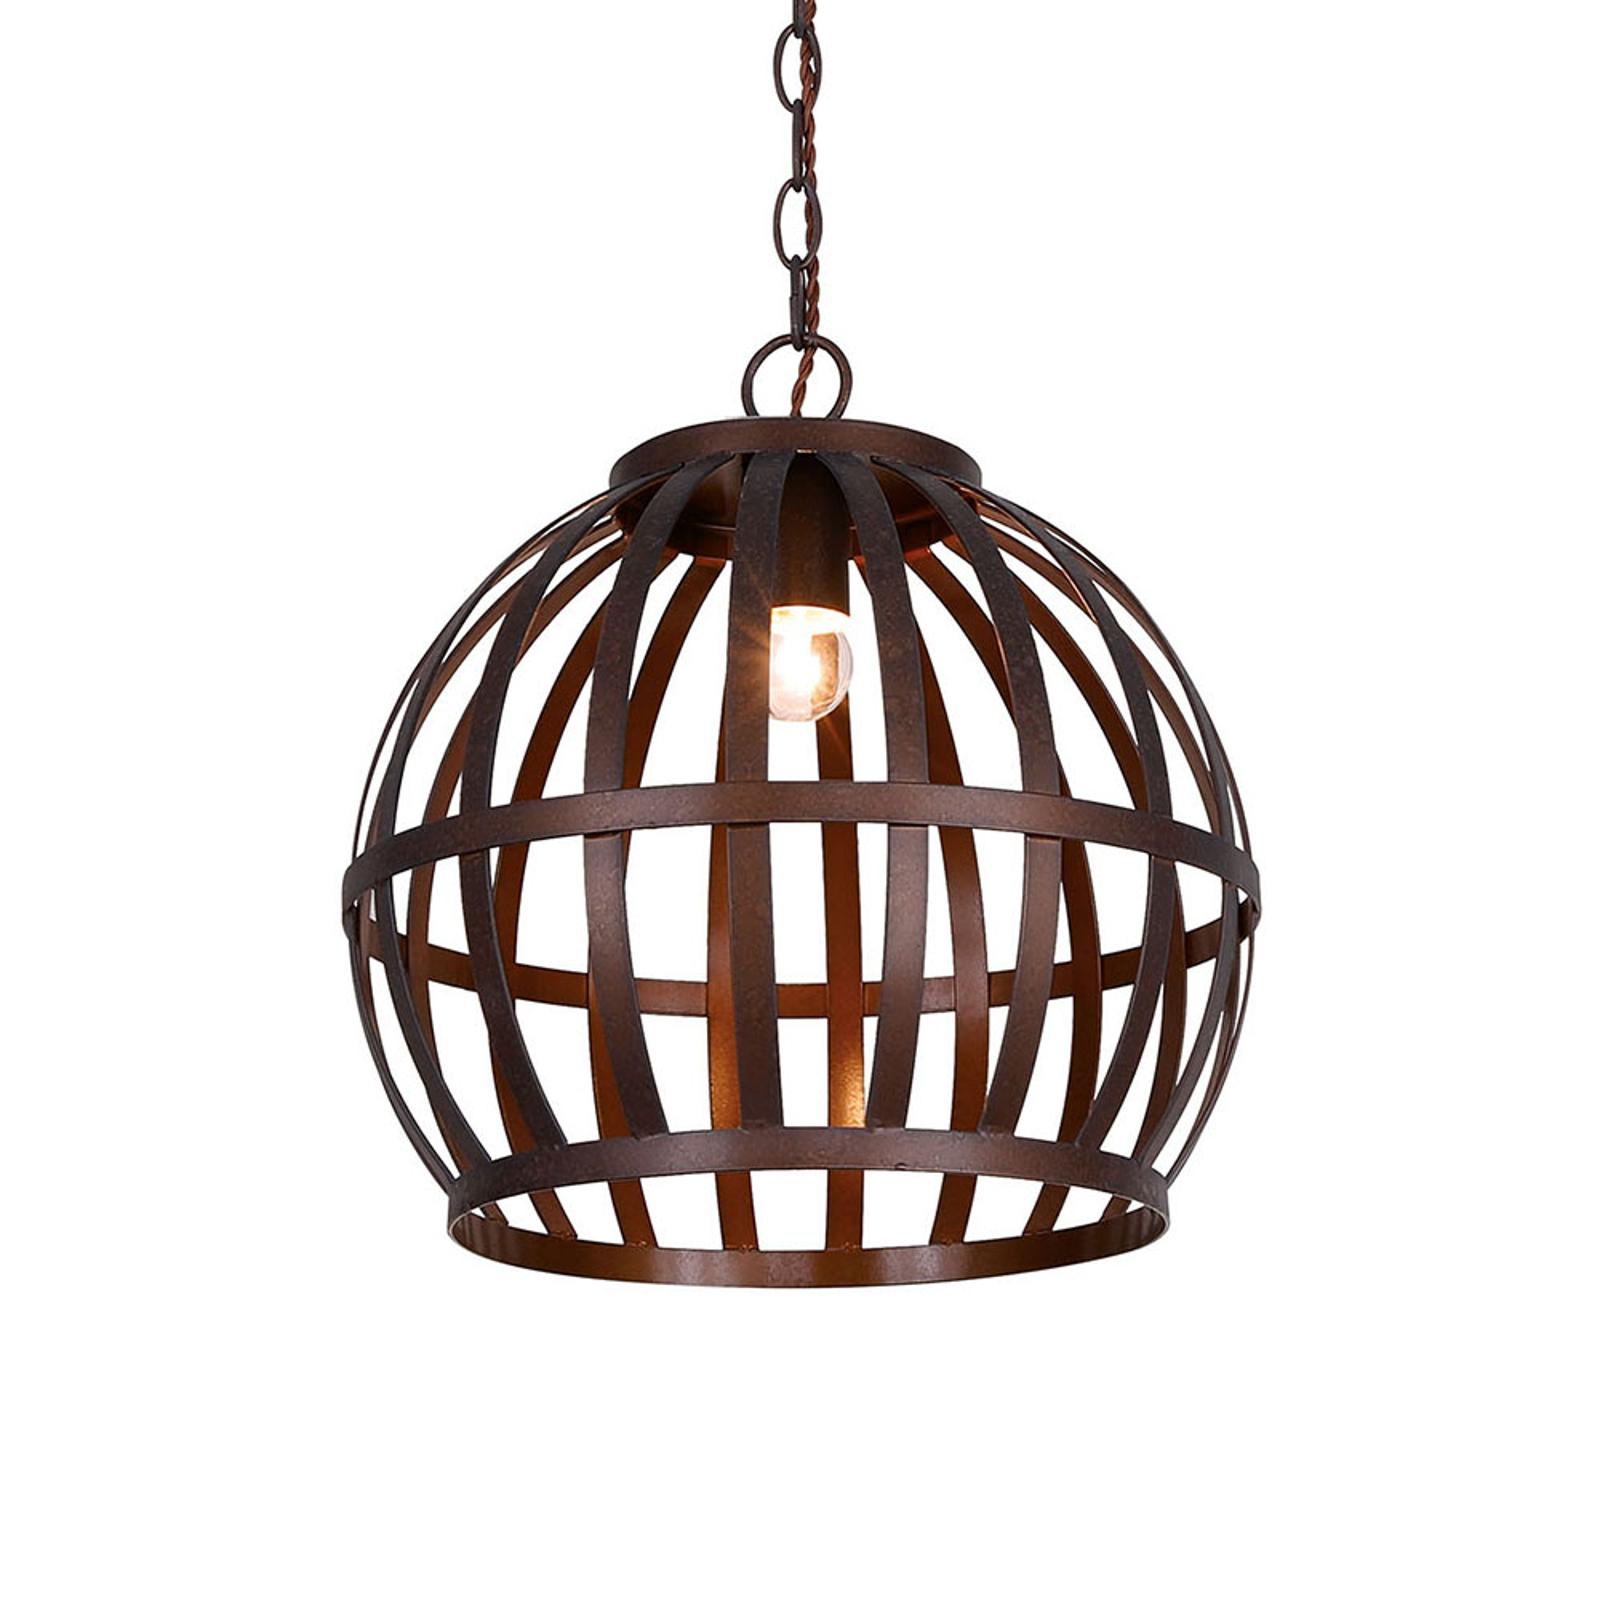 Hanglamp Ralph, kooiconstructie, bruin, Ø 35 cm